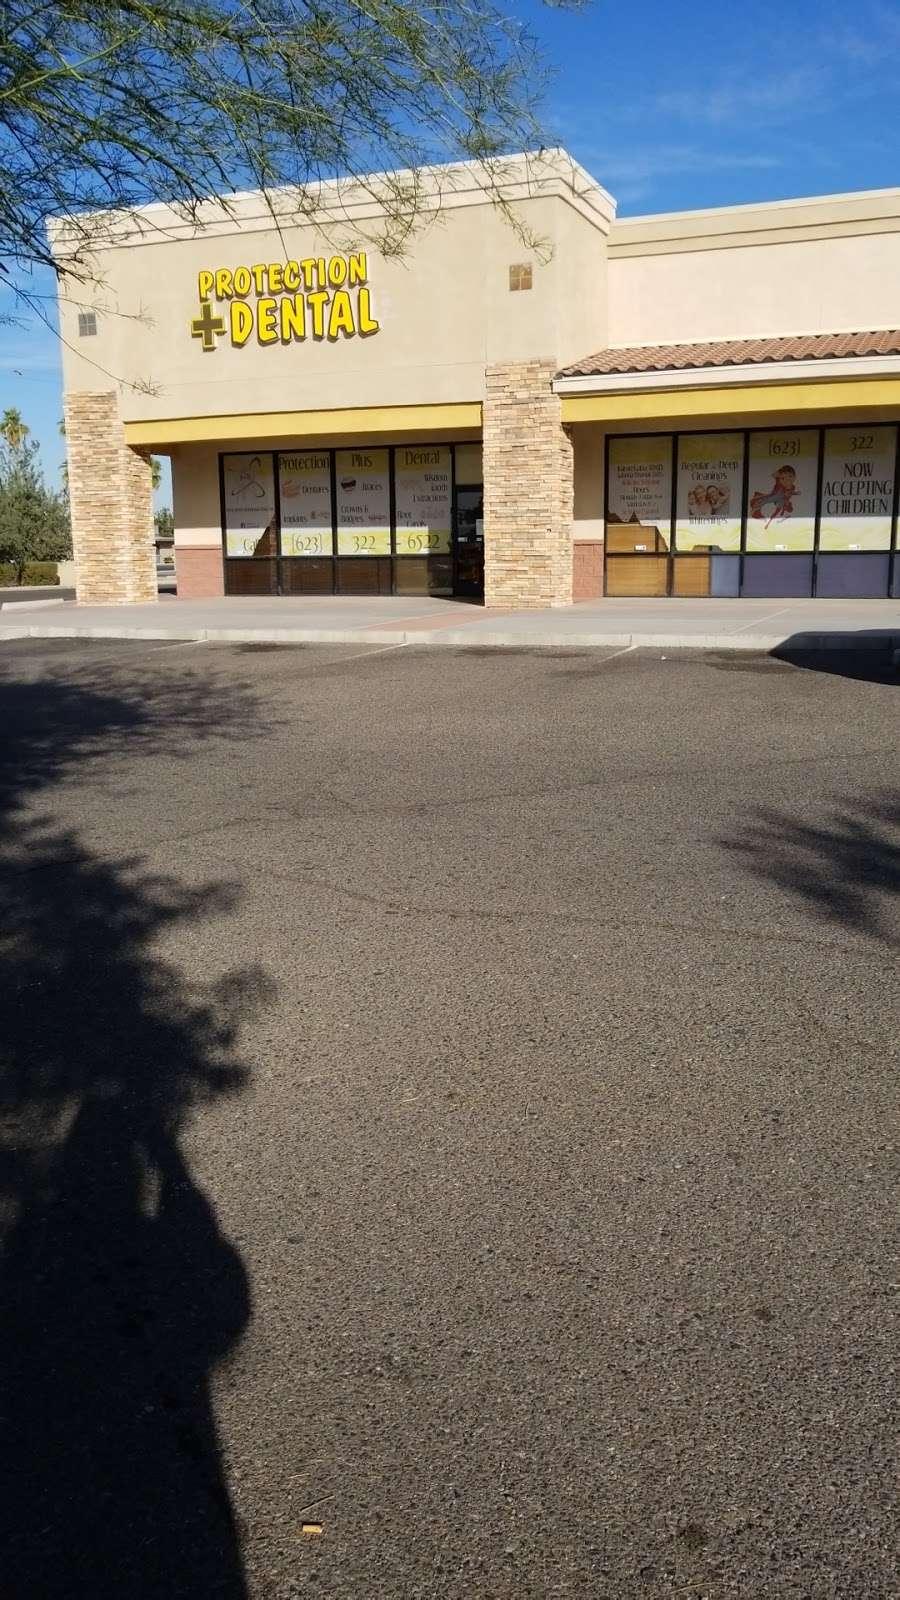 Protection Plus Dental Glendale - dentist  | Photo 3 of 10 | Address: 7025 N 75th Ave #101, Glendale, AZ 85303, USA | Phone: (623) 322-1399